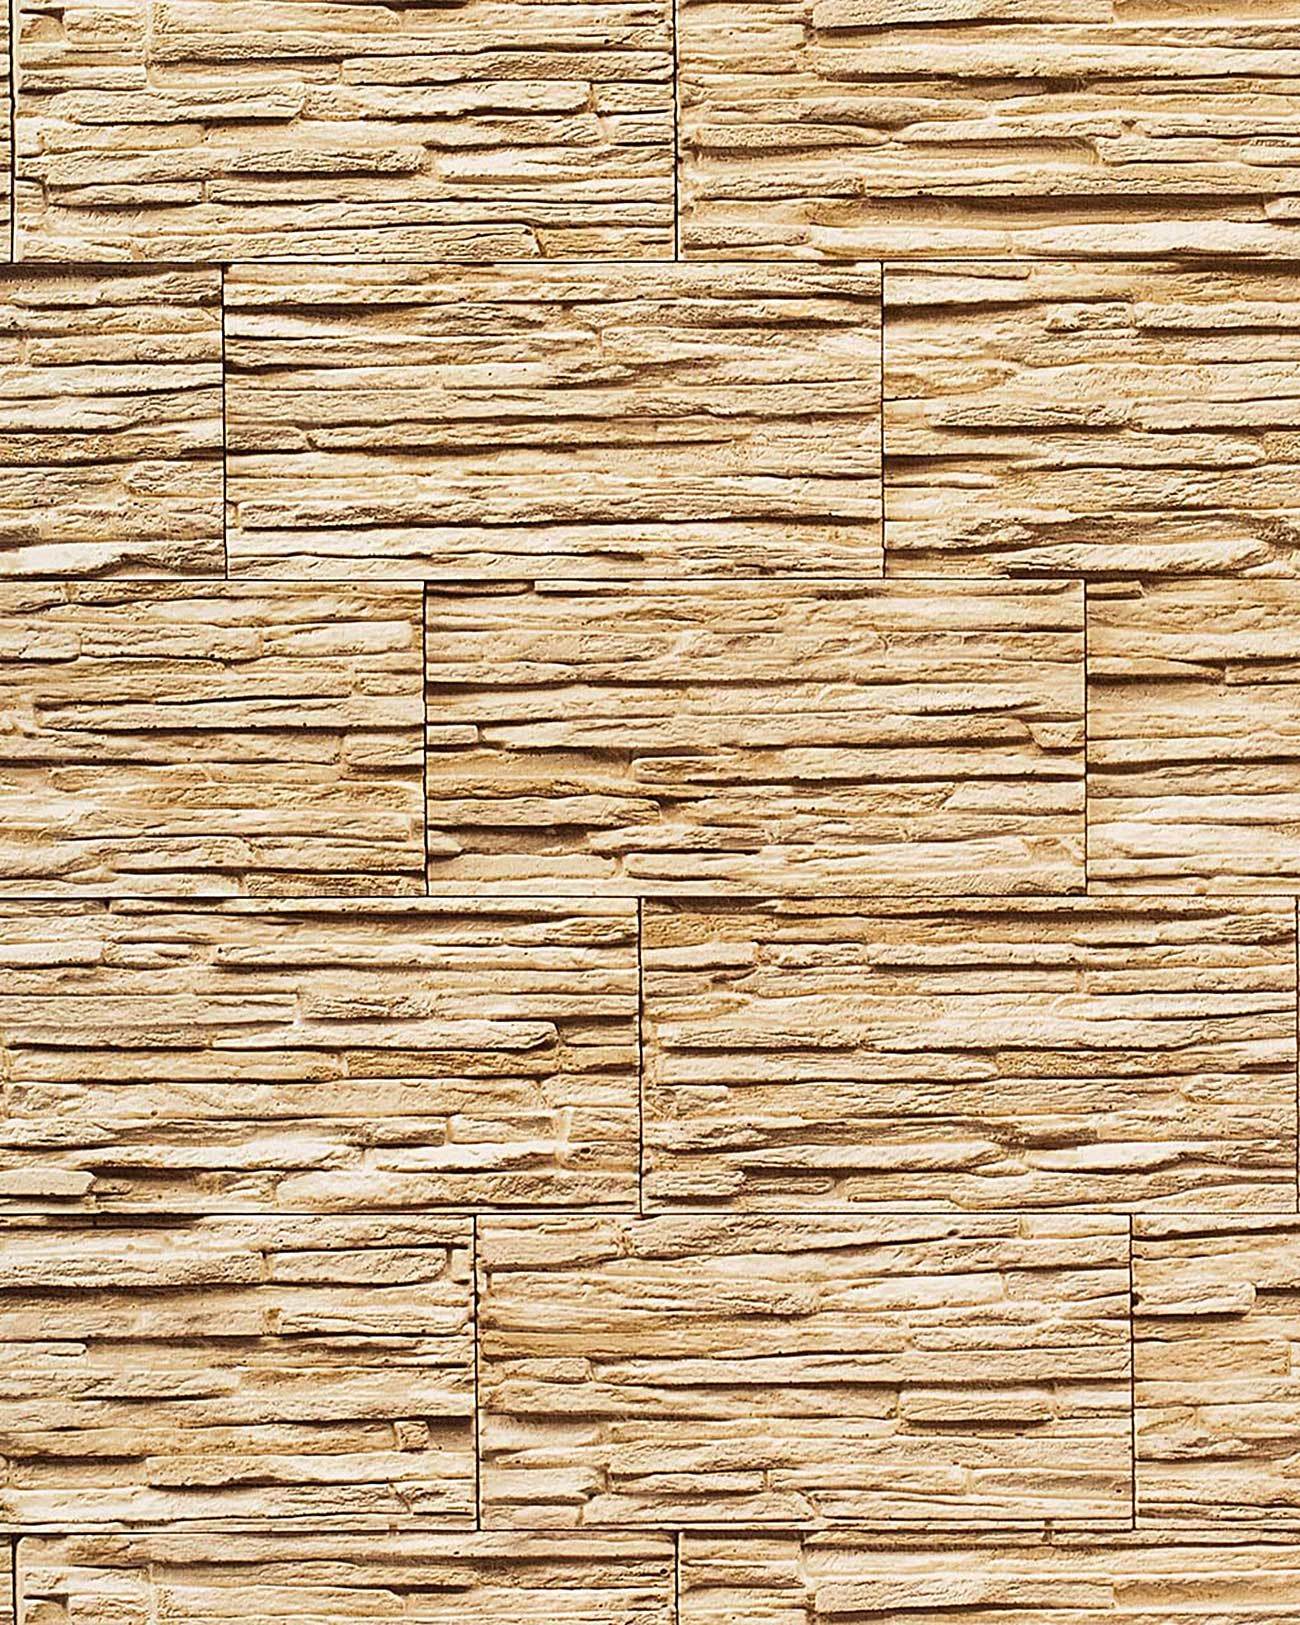 Vinyl wallpaper wall modern textured stone natural 1003 31 brick decor 1300x1625